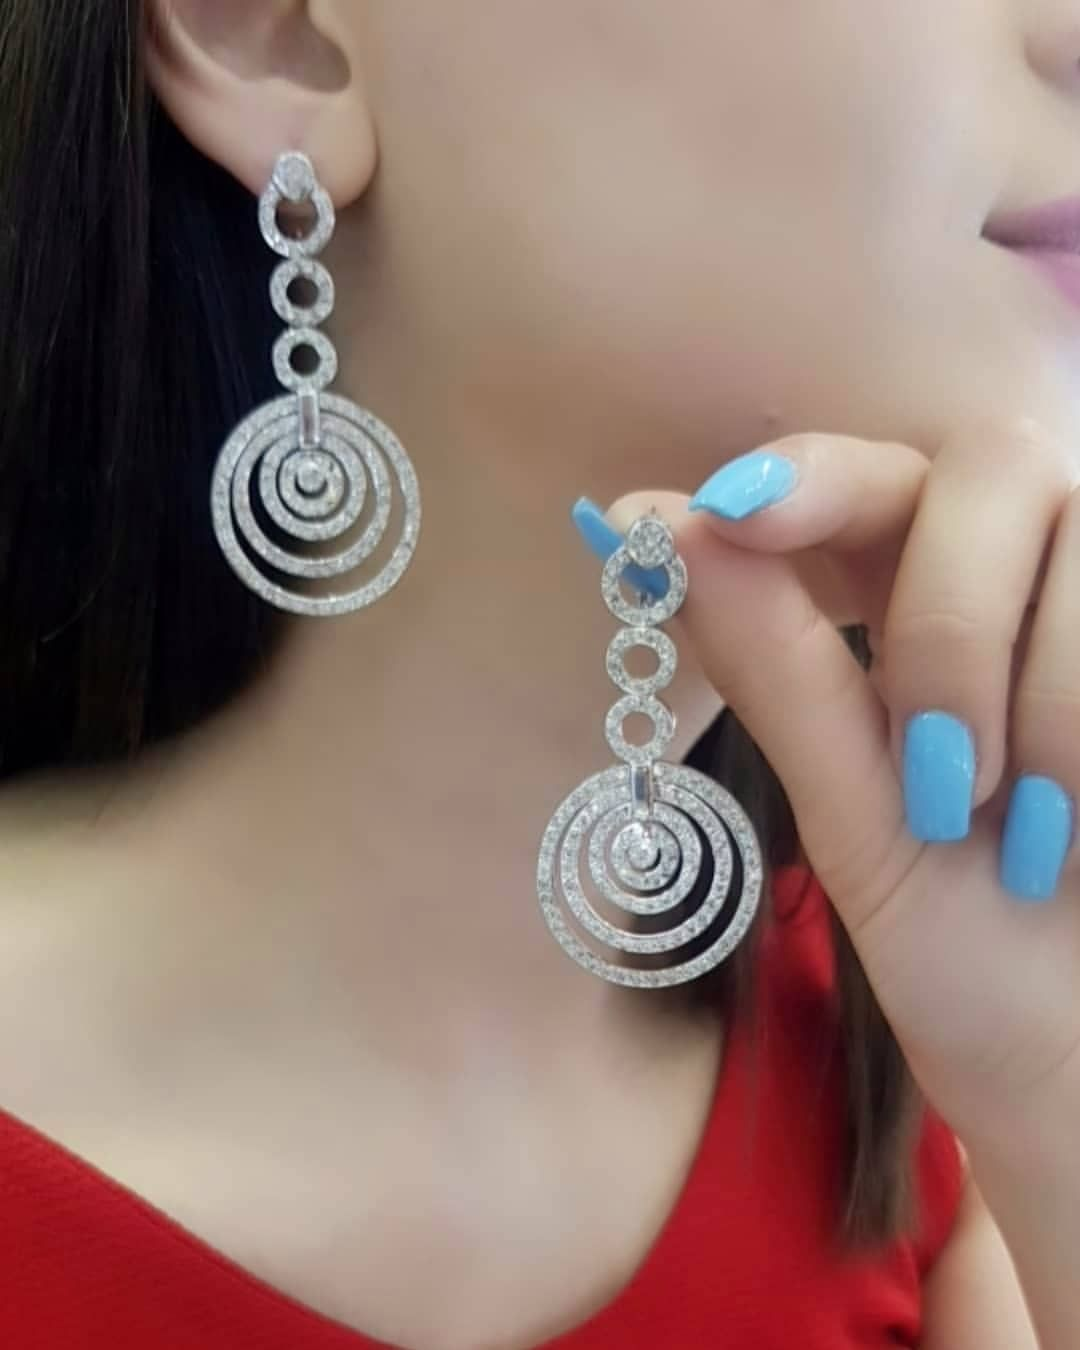 Lacin Ticaret Merkezi Xalqlar On Instagram Dunyanin Butun Sergilerinden Getirilmis Qizil Briliyant Zinet Jewelry Diamond Dreams Ear Cuff